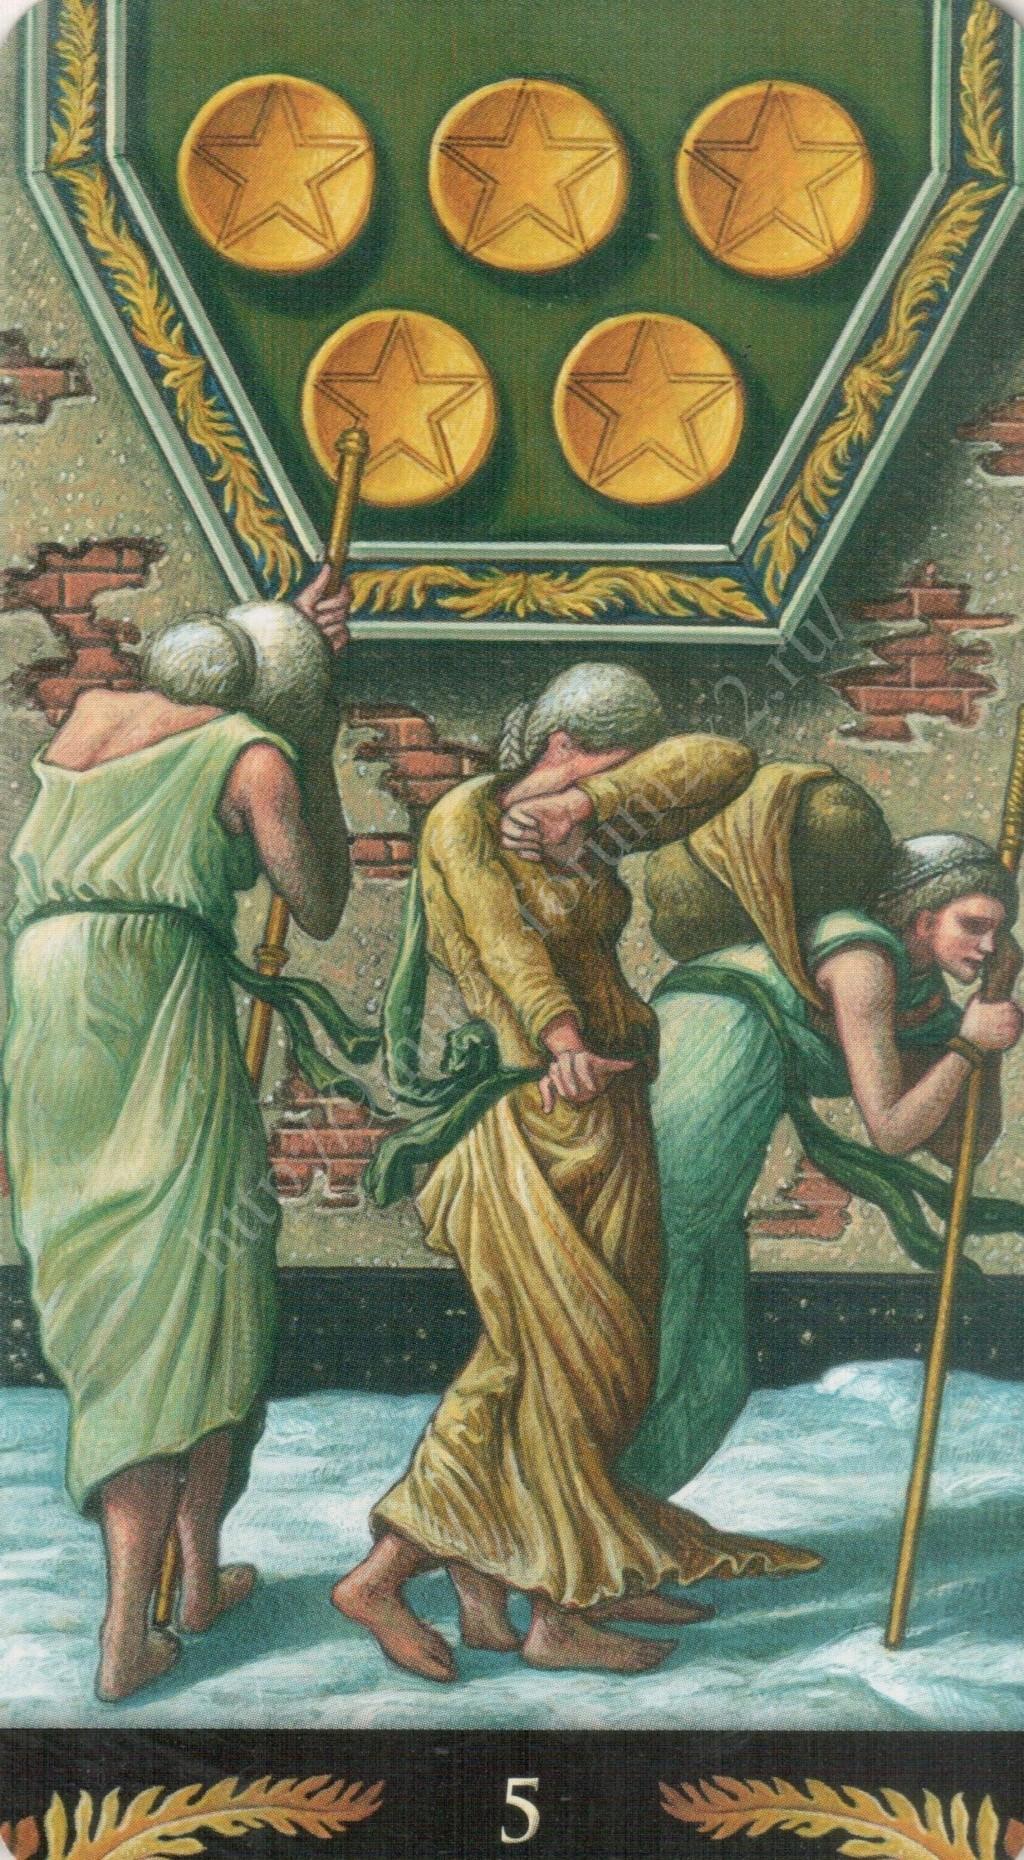 Таро Прерафаэлитов (Pre-Raphaelite Tarot) Галерея Water406